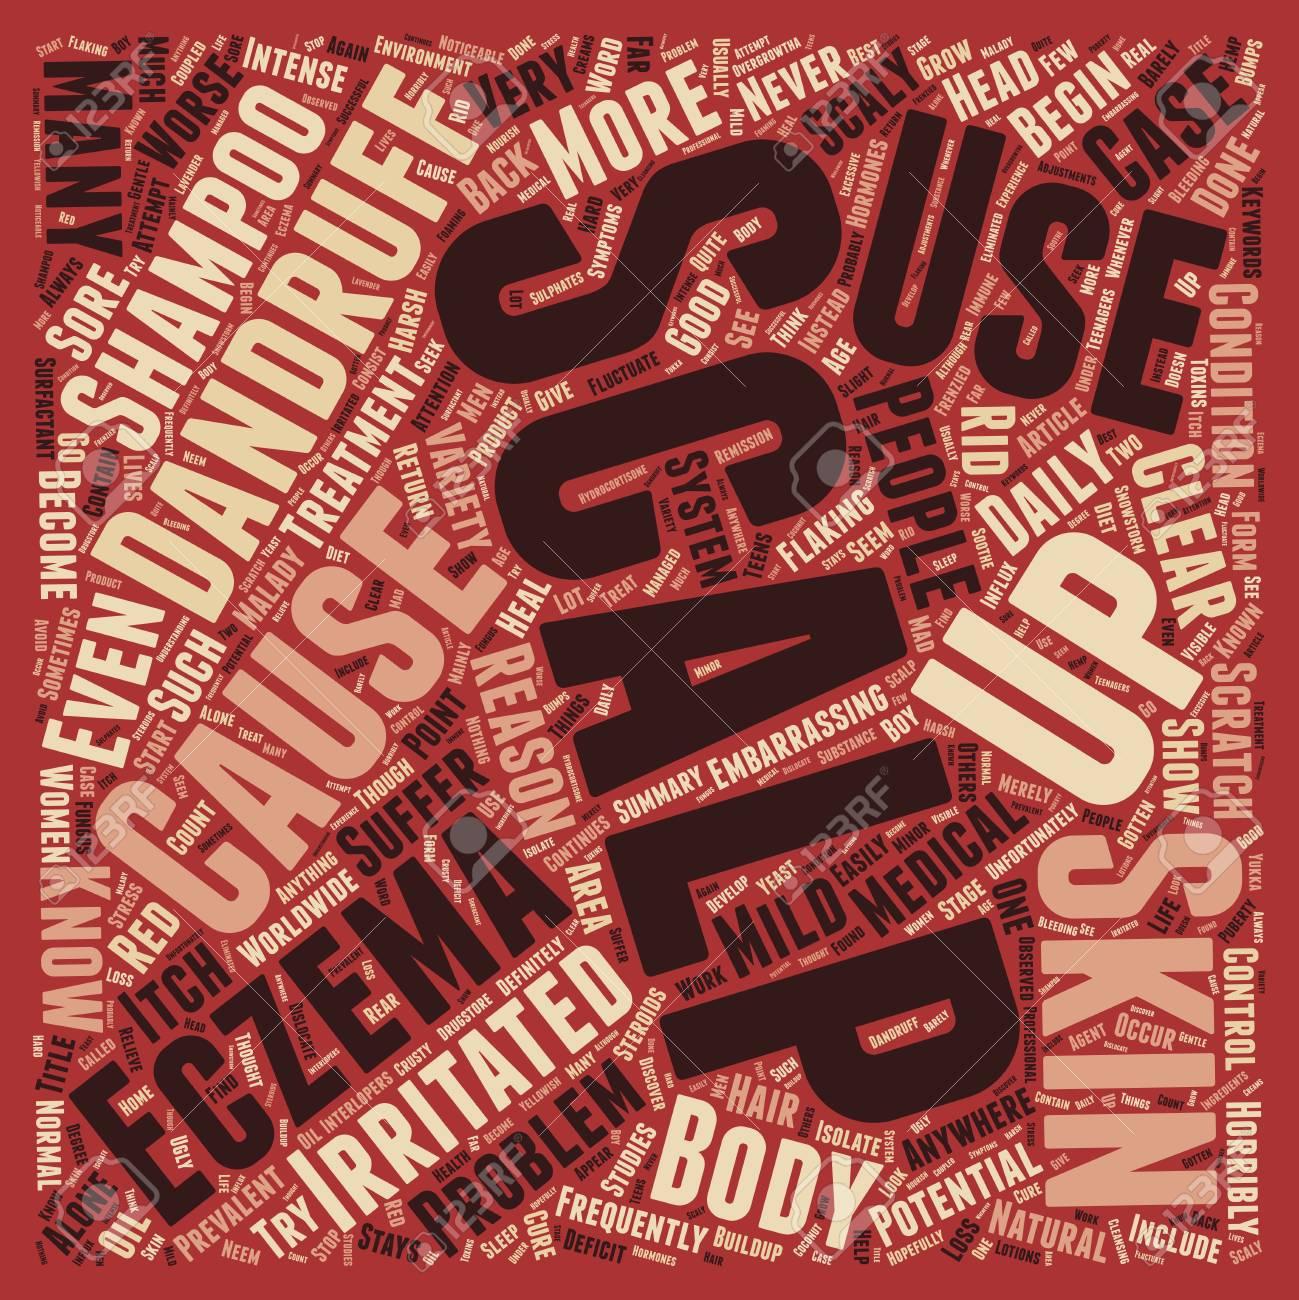 Scalp Eczema 3 Text Background Wordcloud Concept Royalty 1299x1300